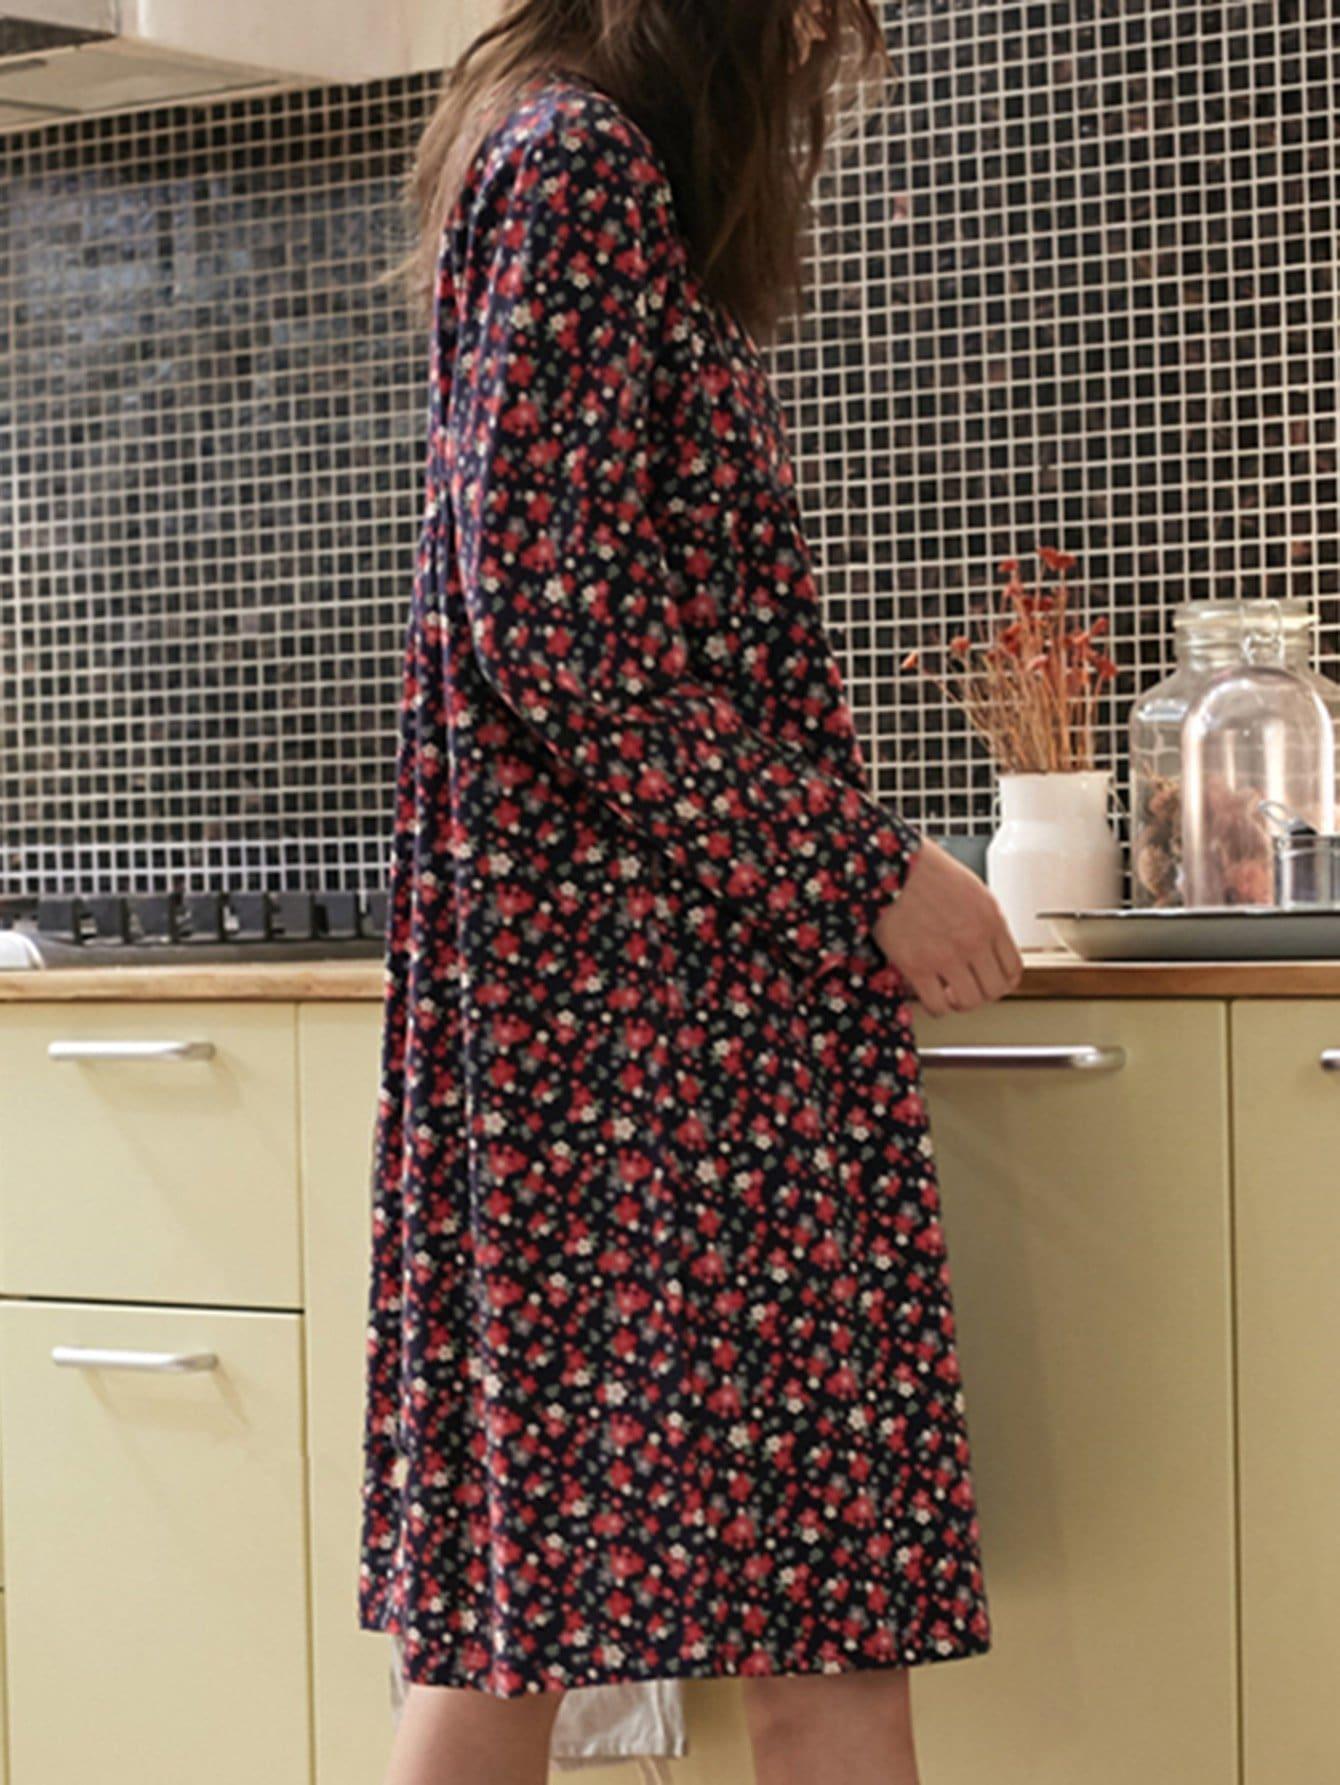 Calico Print Dress